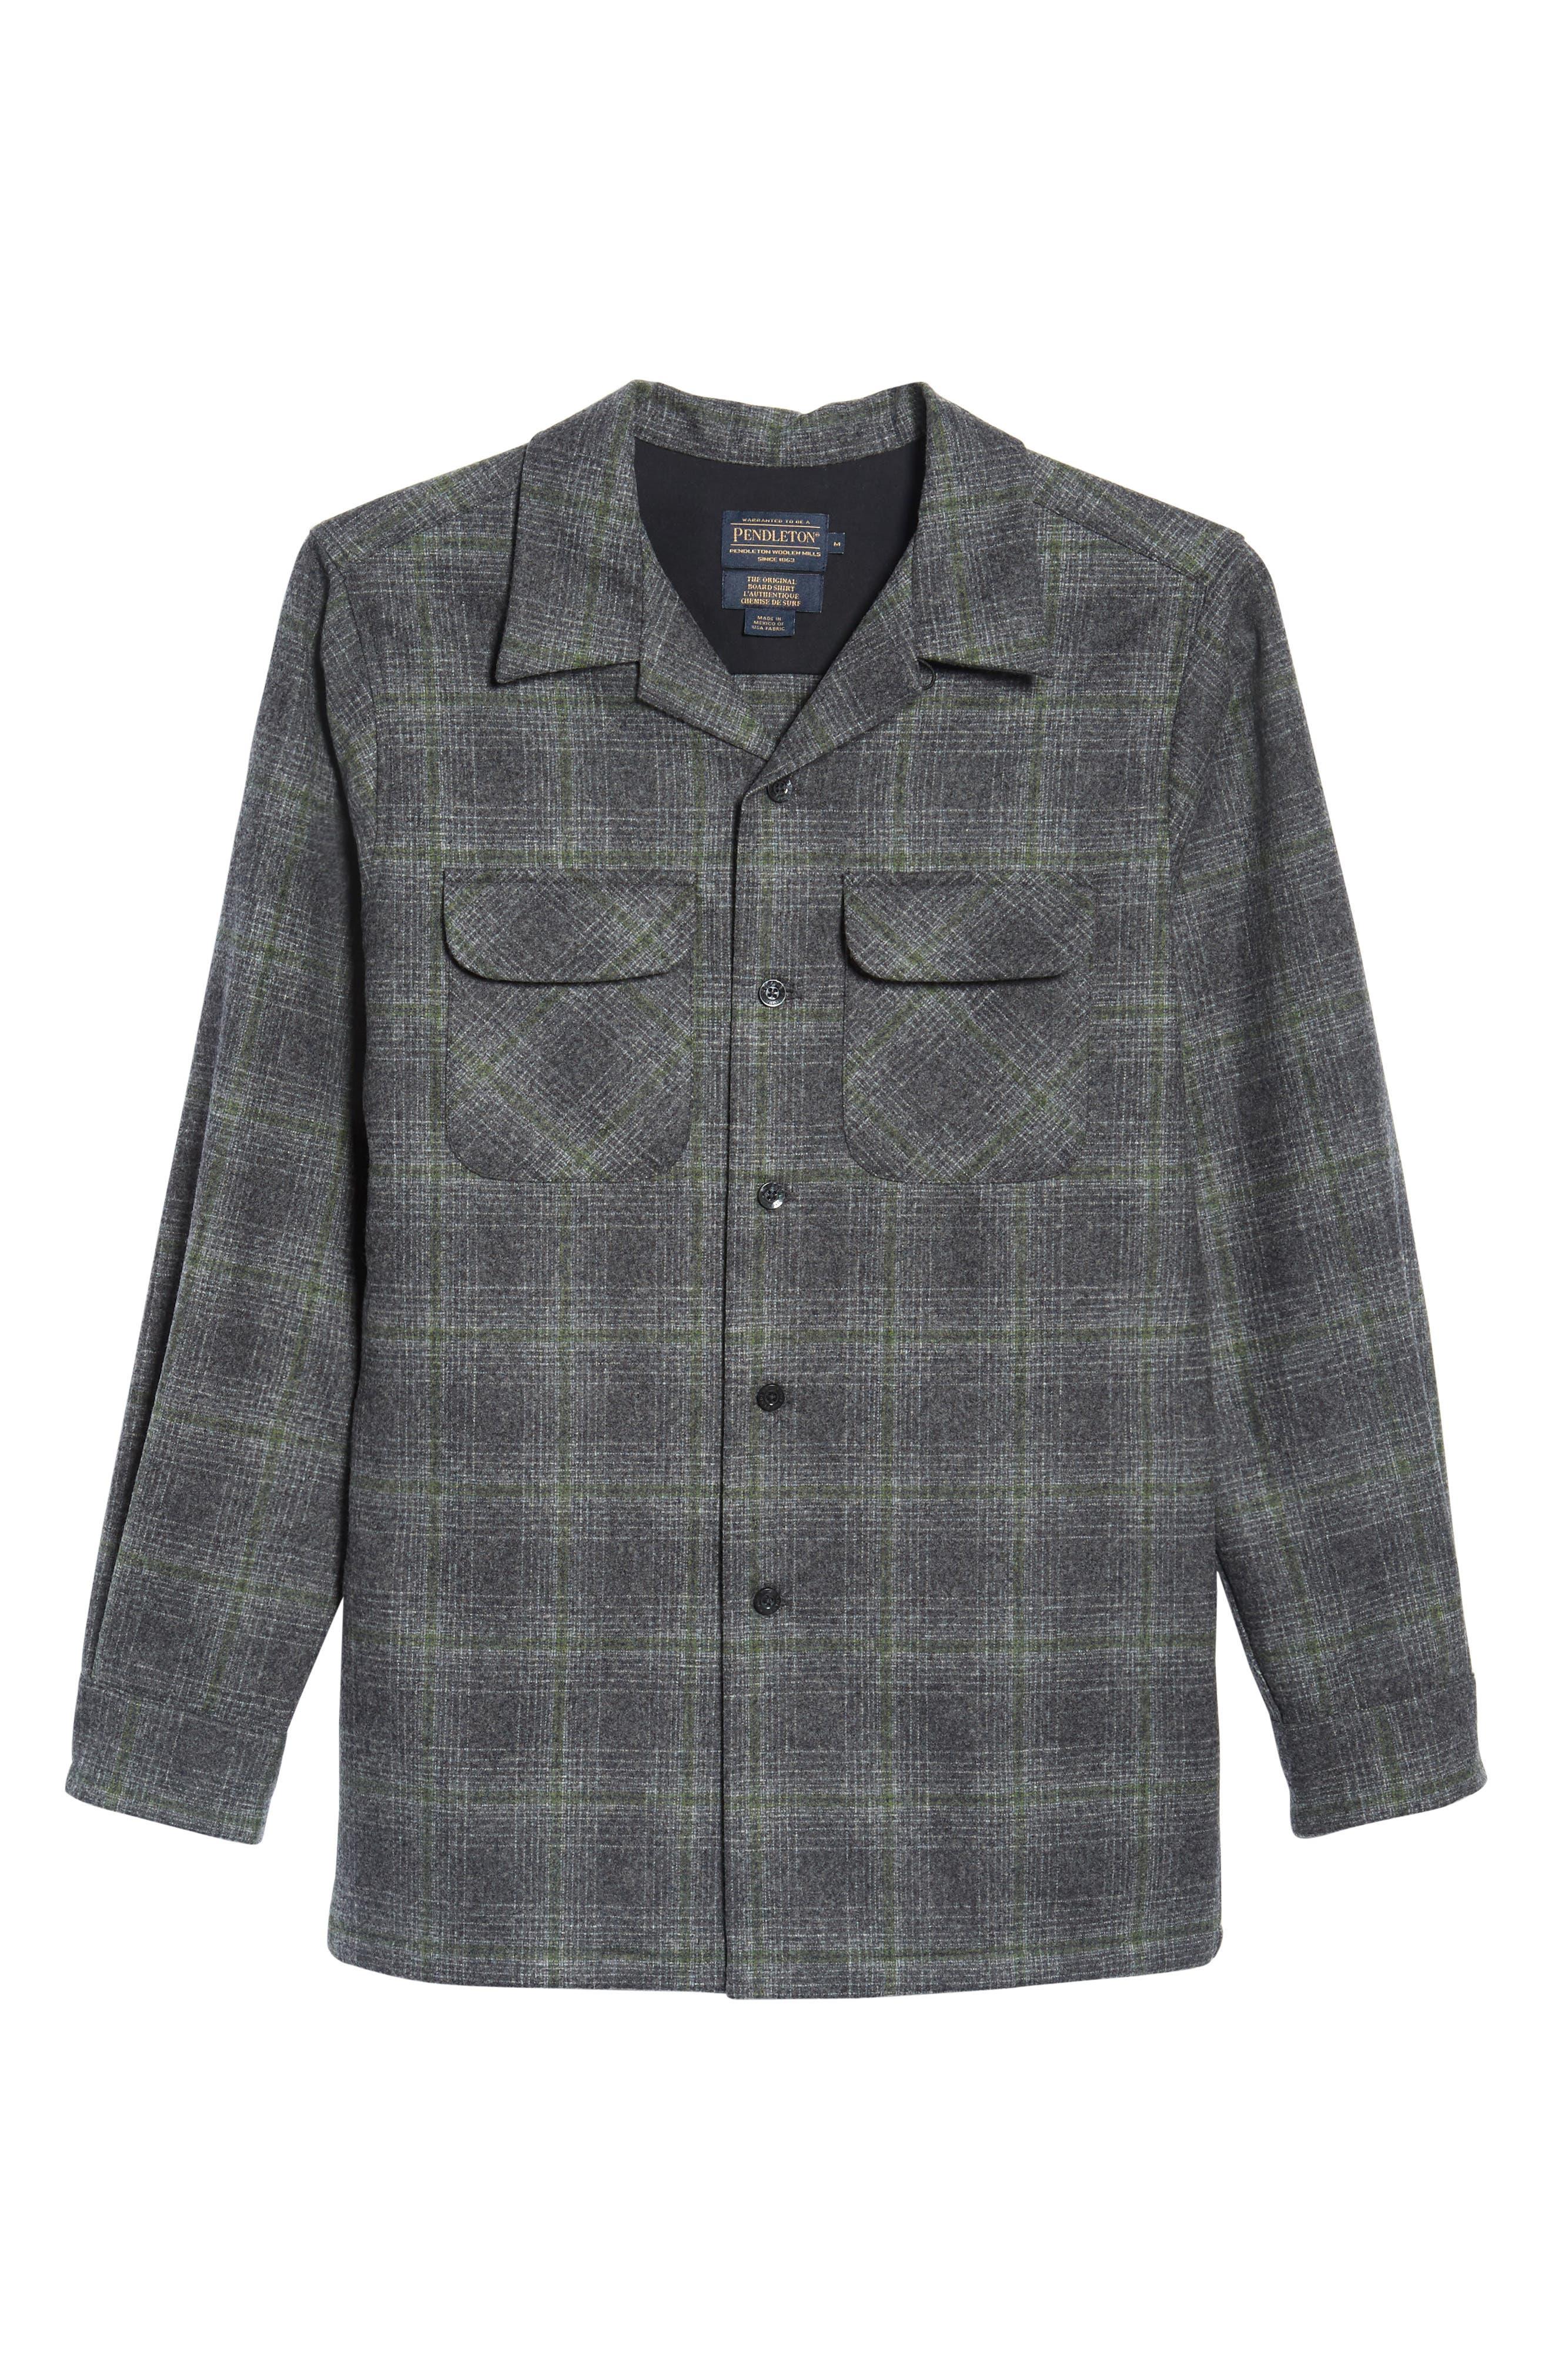 'Board' Regular Fit Flannel Shirt,                             Alternate thumbnail 6, color,                             031